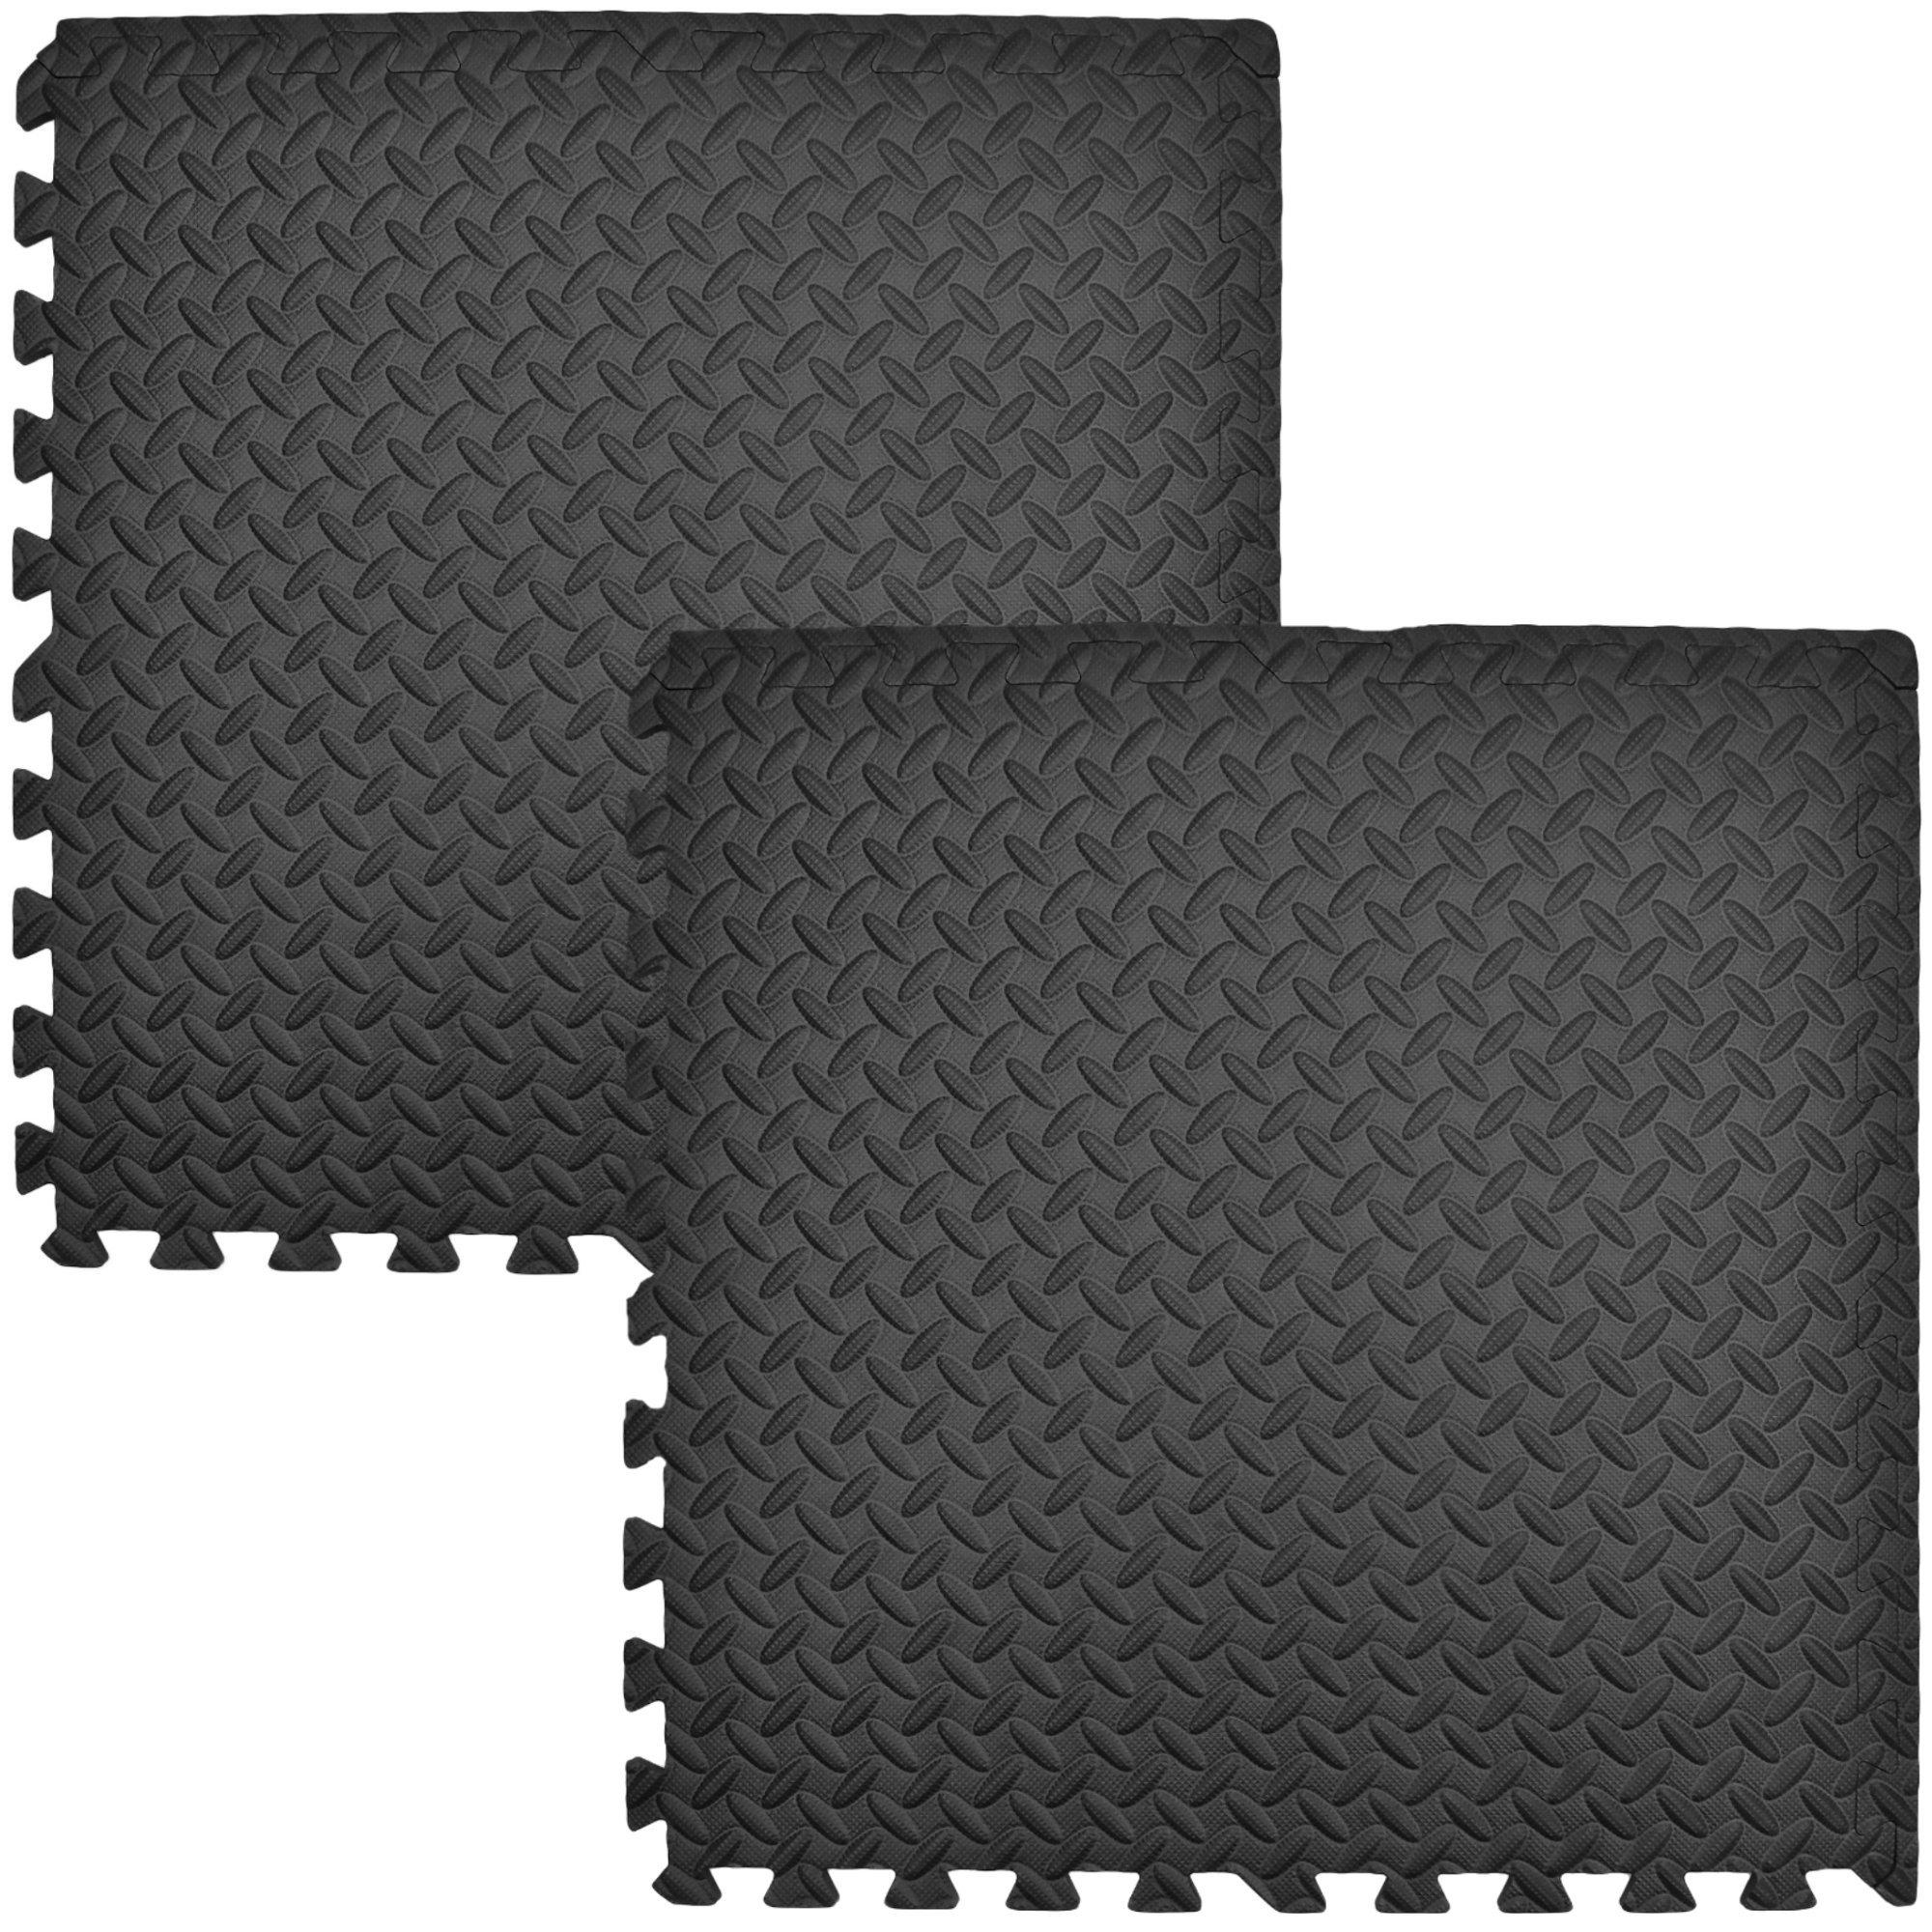 Humbi Mata piankowa puzzle piankowe fitness 2 szt. czarny 62 x 62 x 1 cm